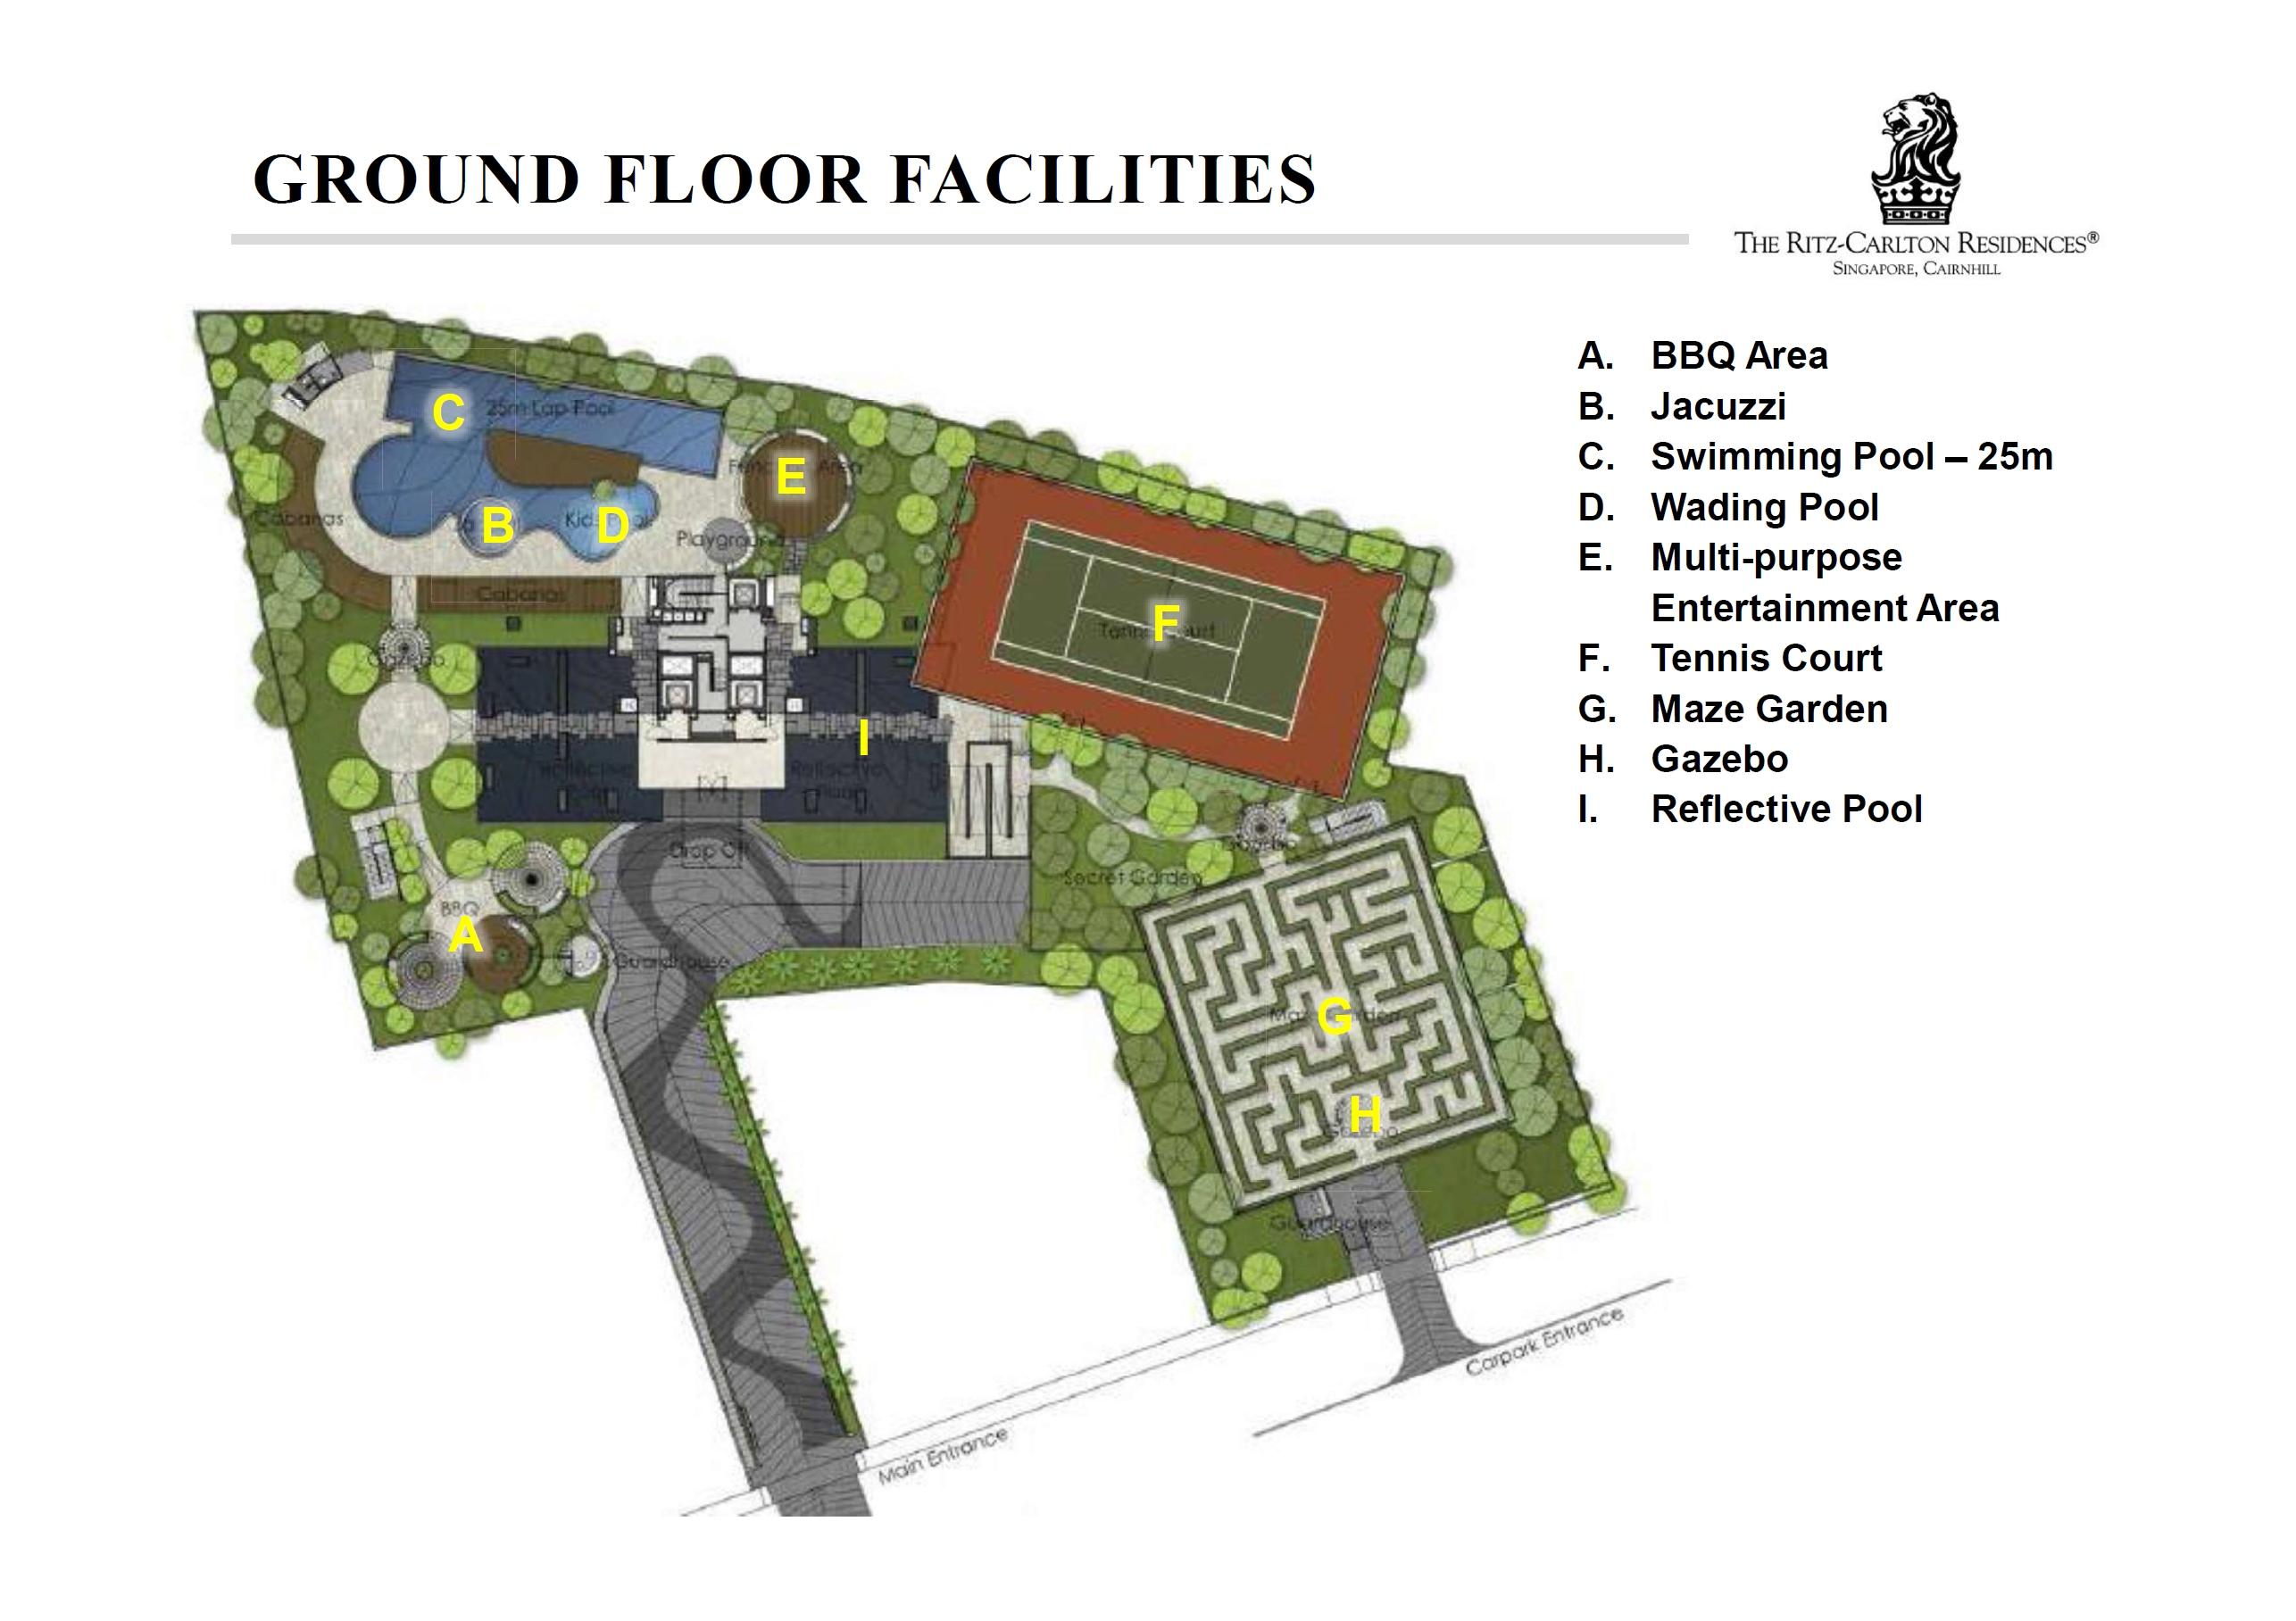 The Ritz-Carlton Residences site plan